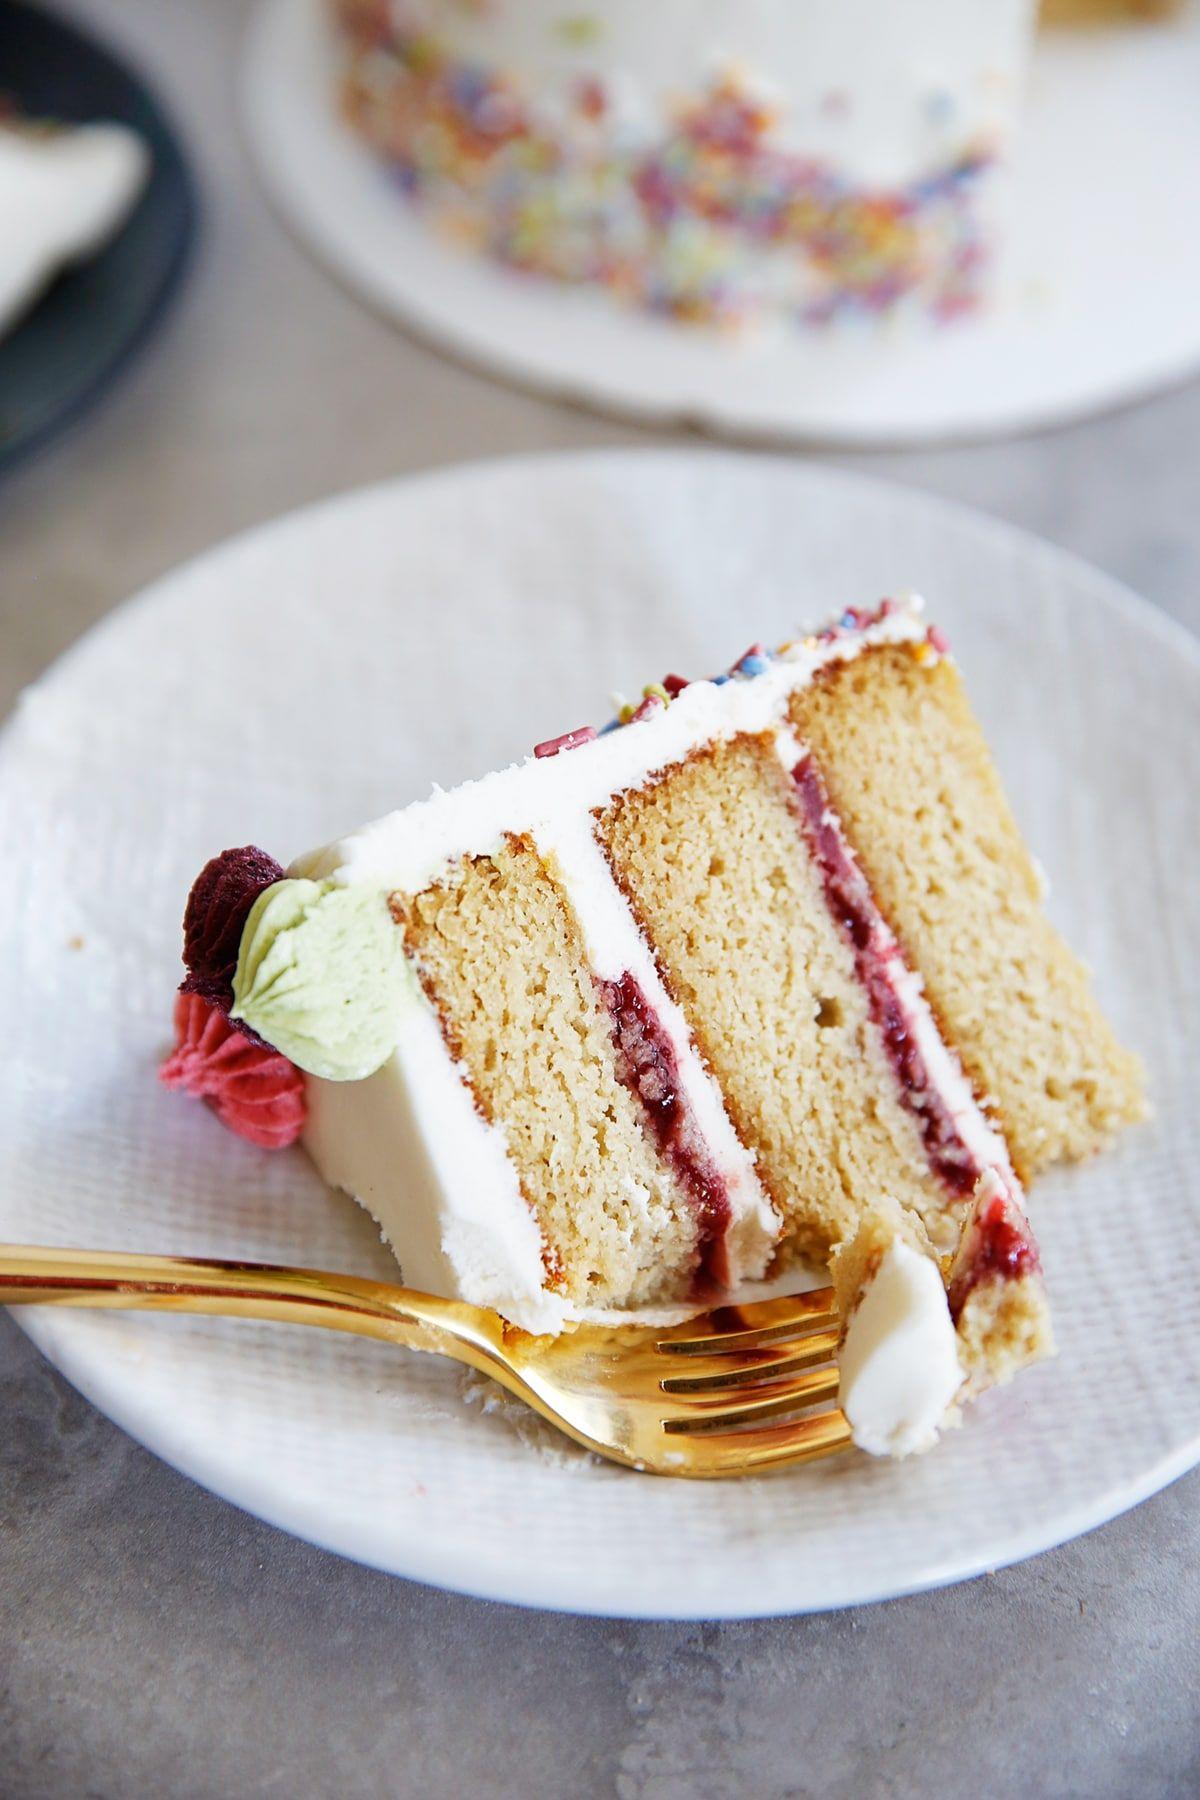 The Best Gluten Free Layer Birthday Cake Lexi S Clean Kitchen Recipe Birthday Cake Flavors Gluten Free Birthday Cake Recipe Cool Birthday Cakes